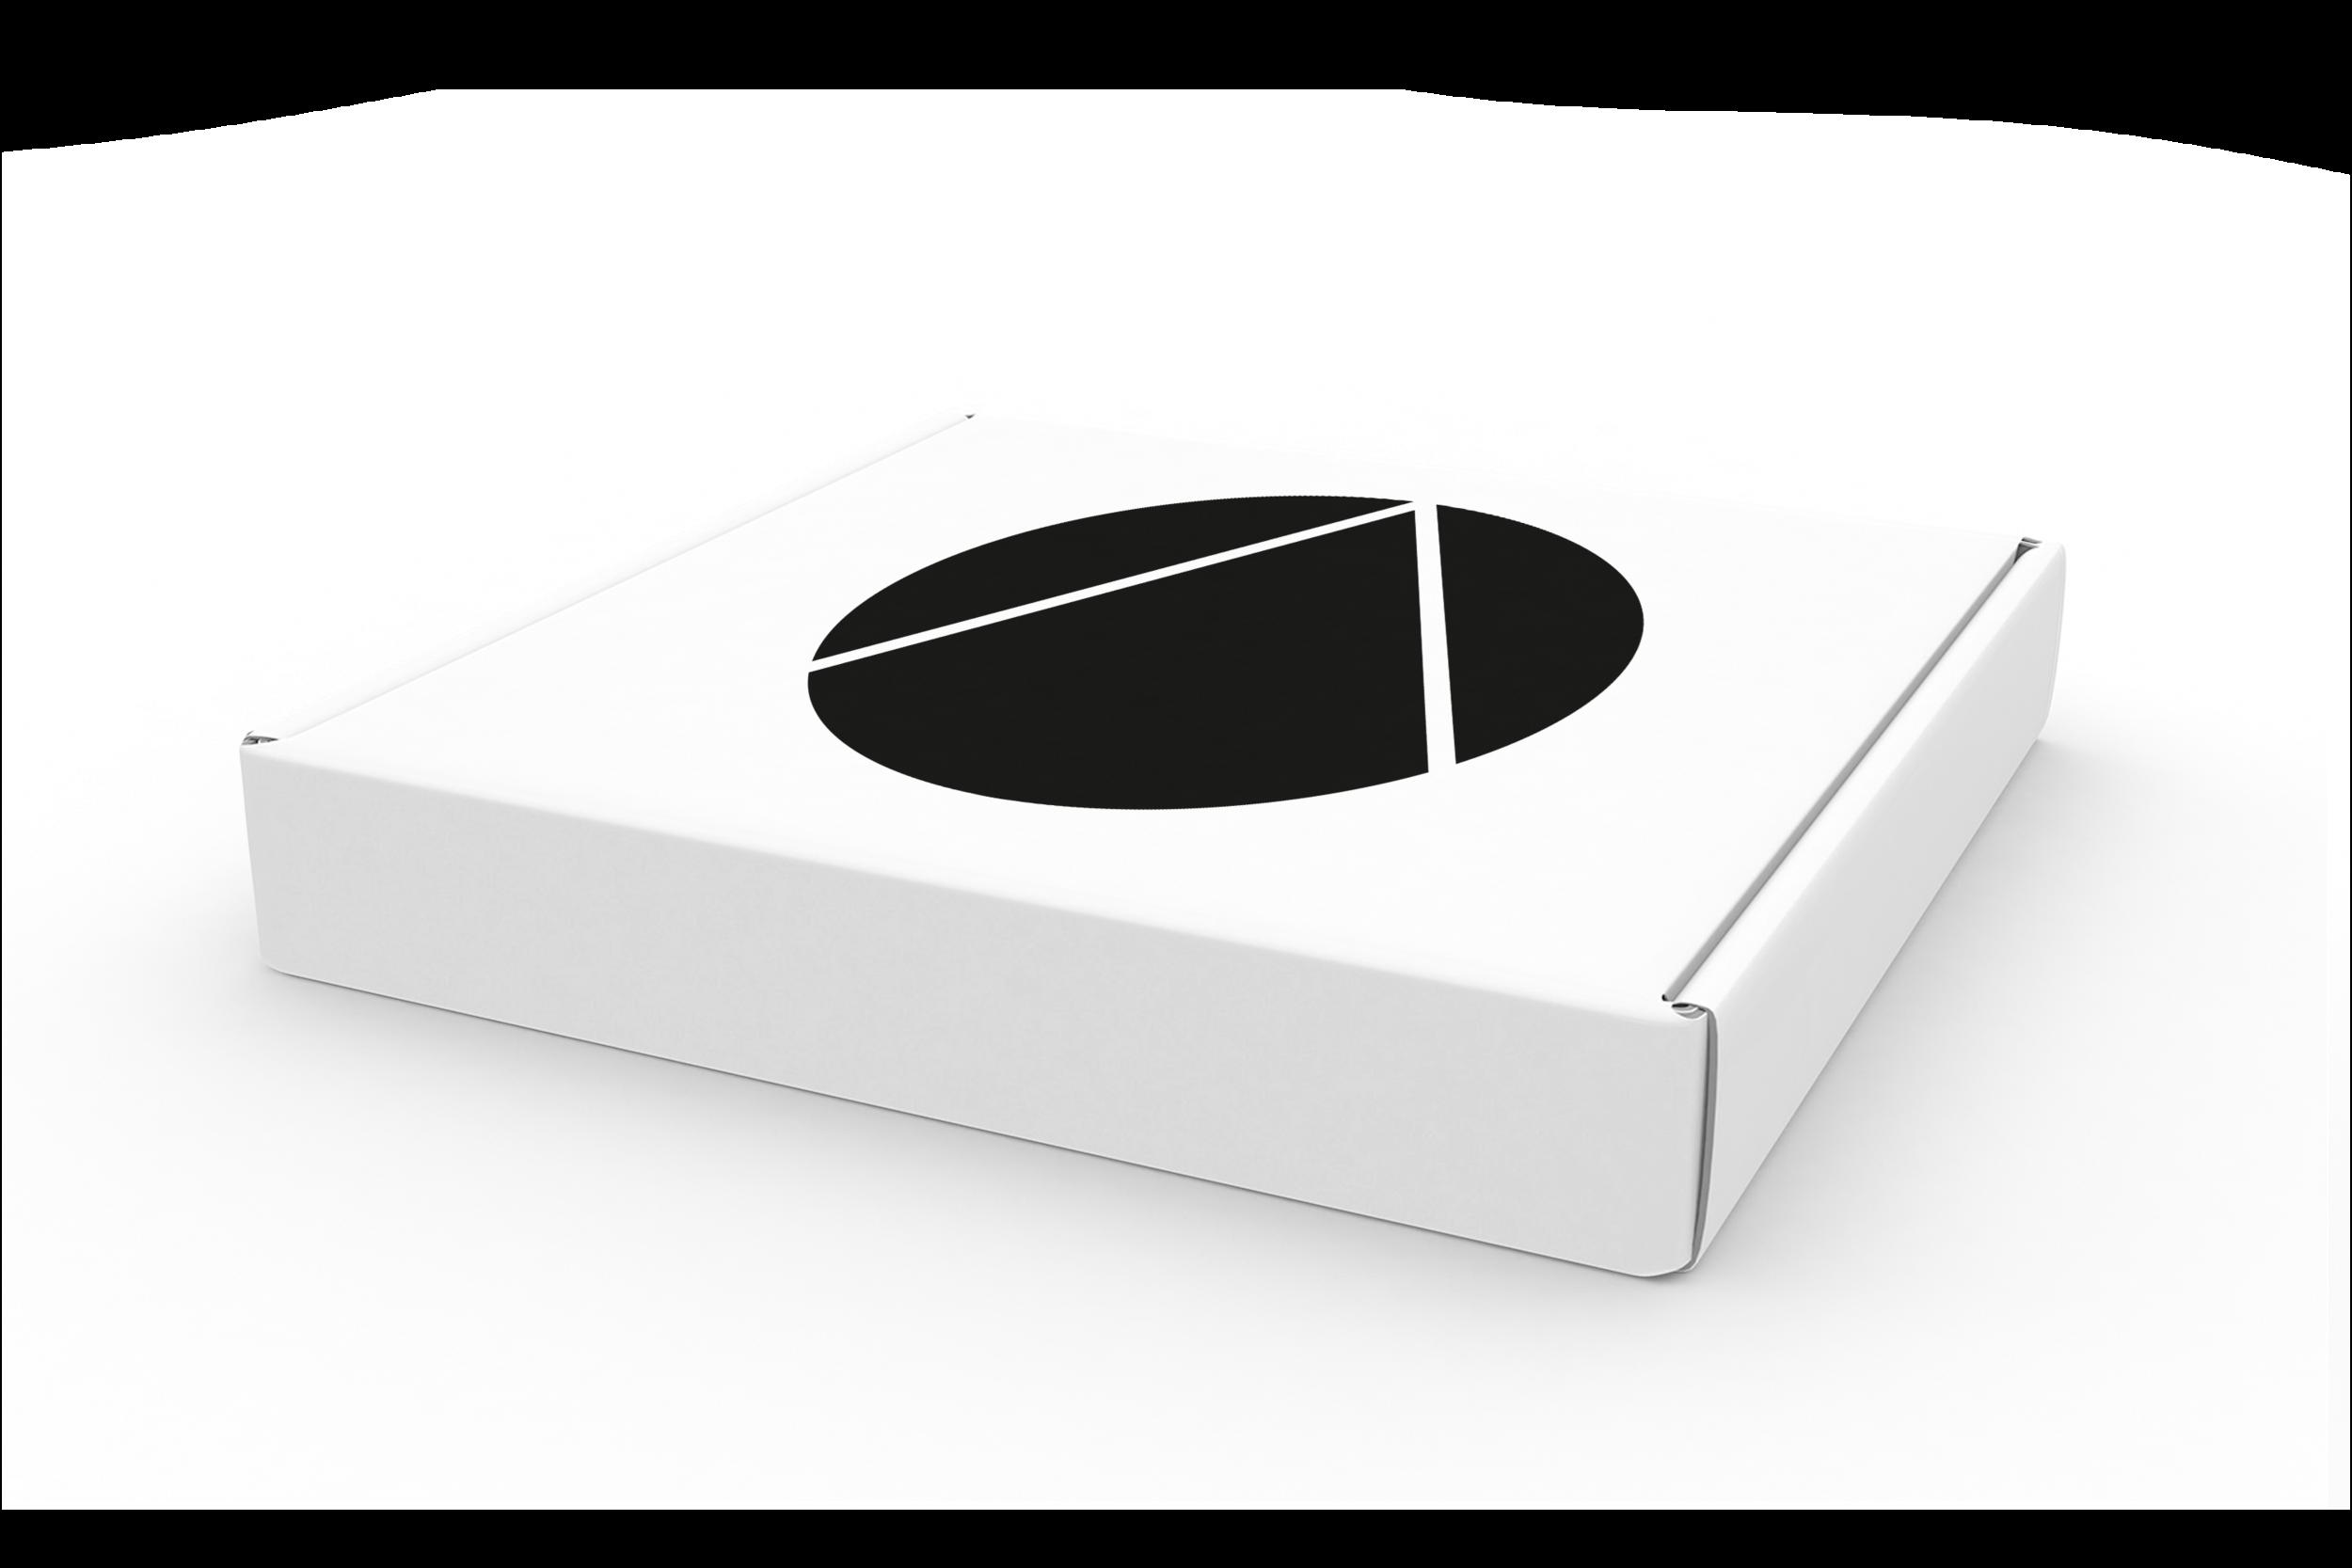 Jaime Mass Nutritionals Shipment Box